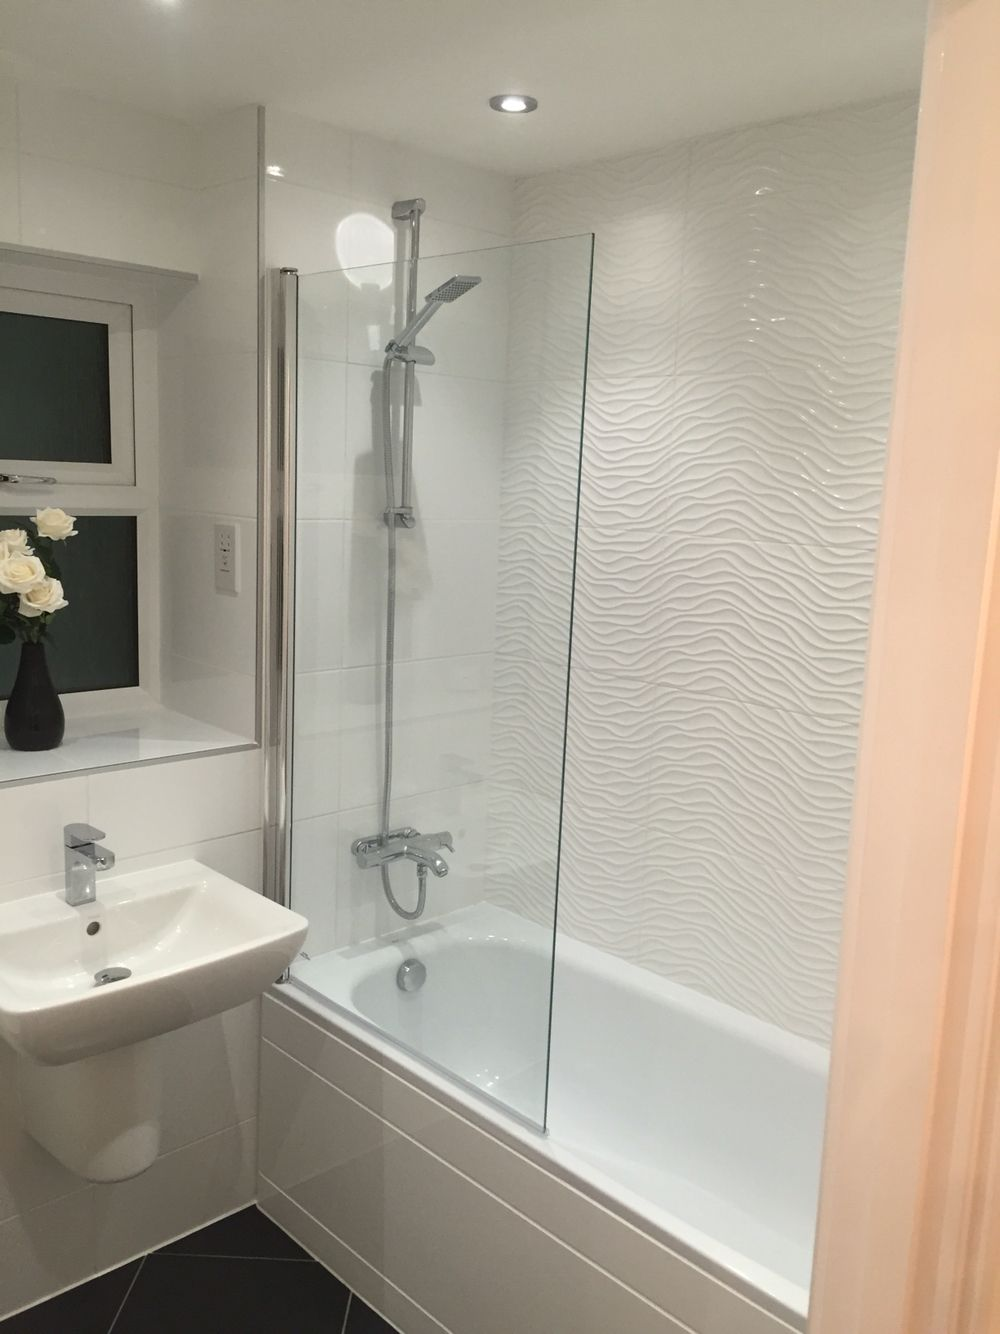 Wave effect bathroom tiles   Bath   Pinterest   Bathroom tiling ...